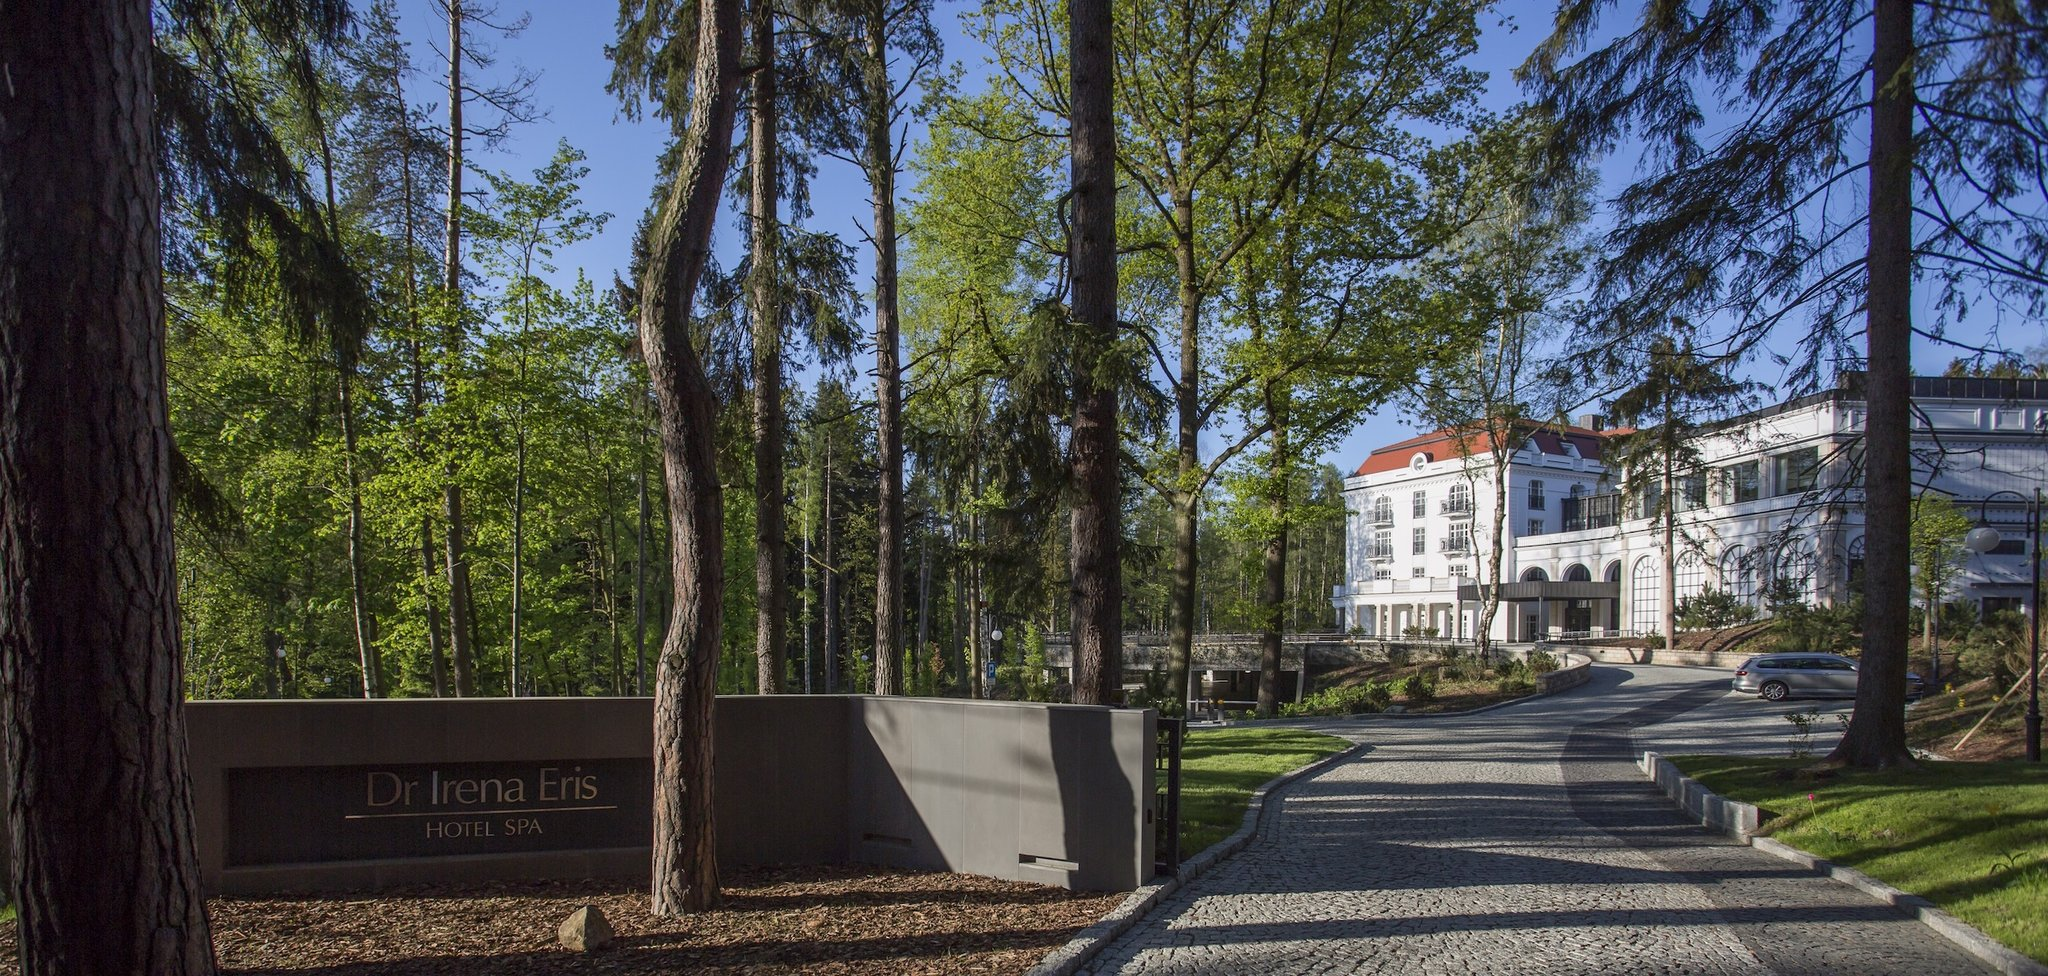 Hotele SPA Dr Irena Eris: siła marki